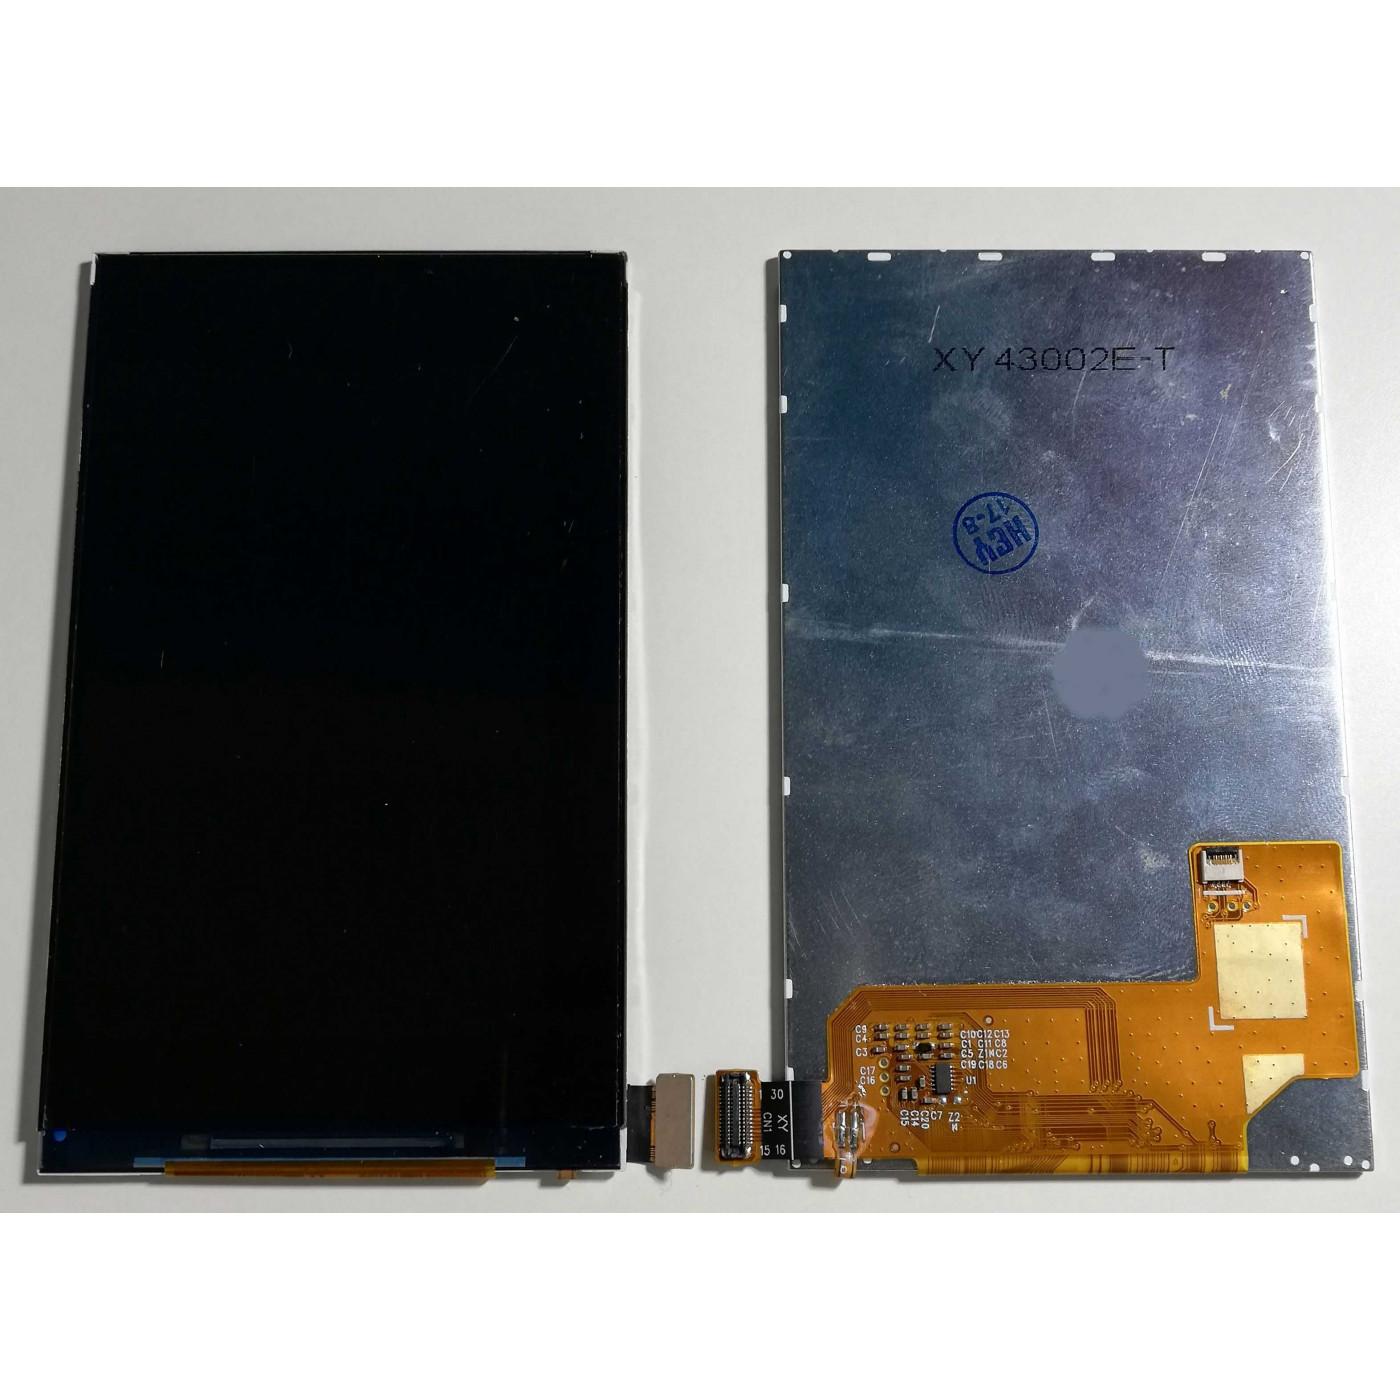 LCD-Display für Samsung Galaxy Core Plus SM G350 G3500 G3502 SCREEN MONITOR